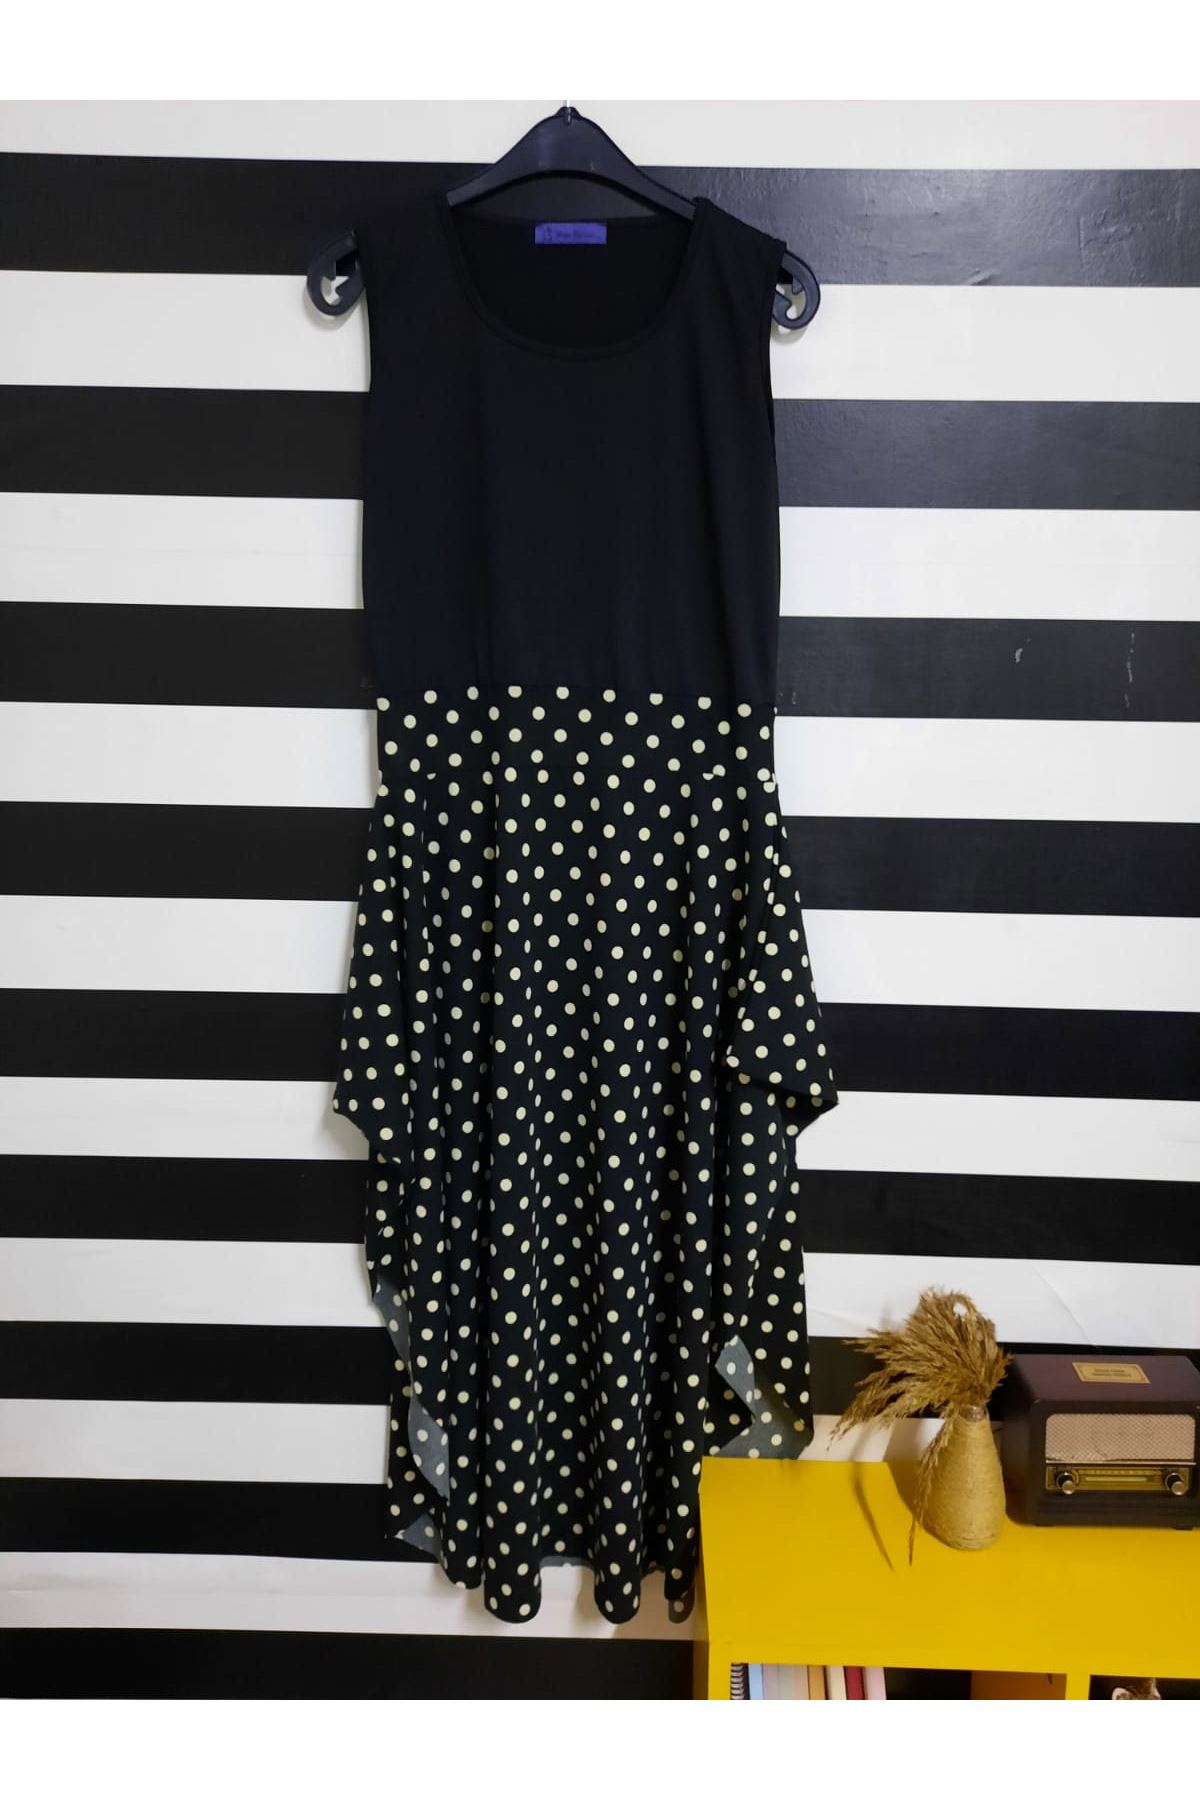 Kısa Kol Etek Desenli Elbise - PUAN